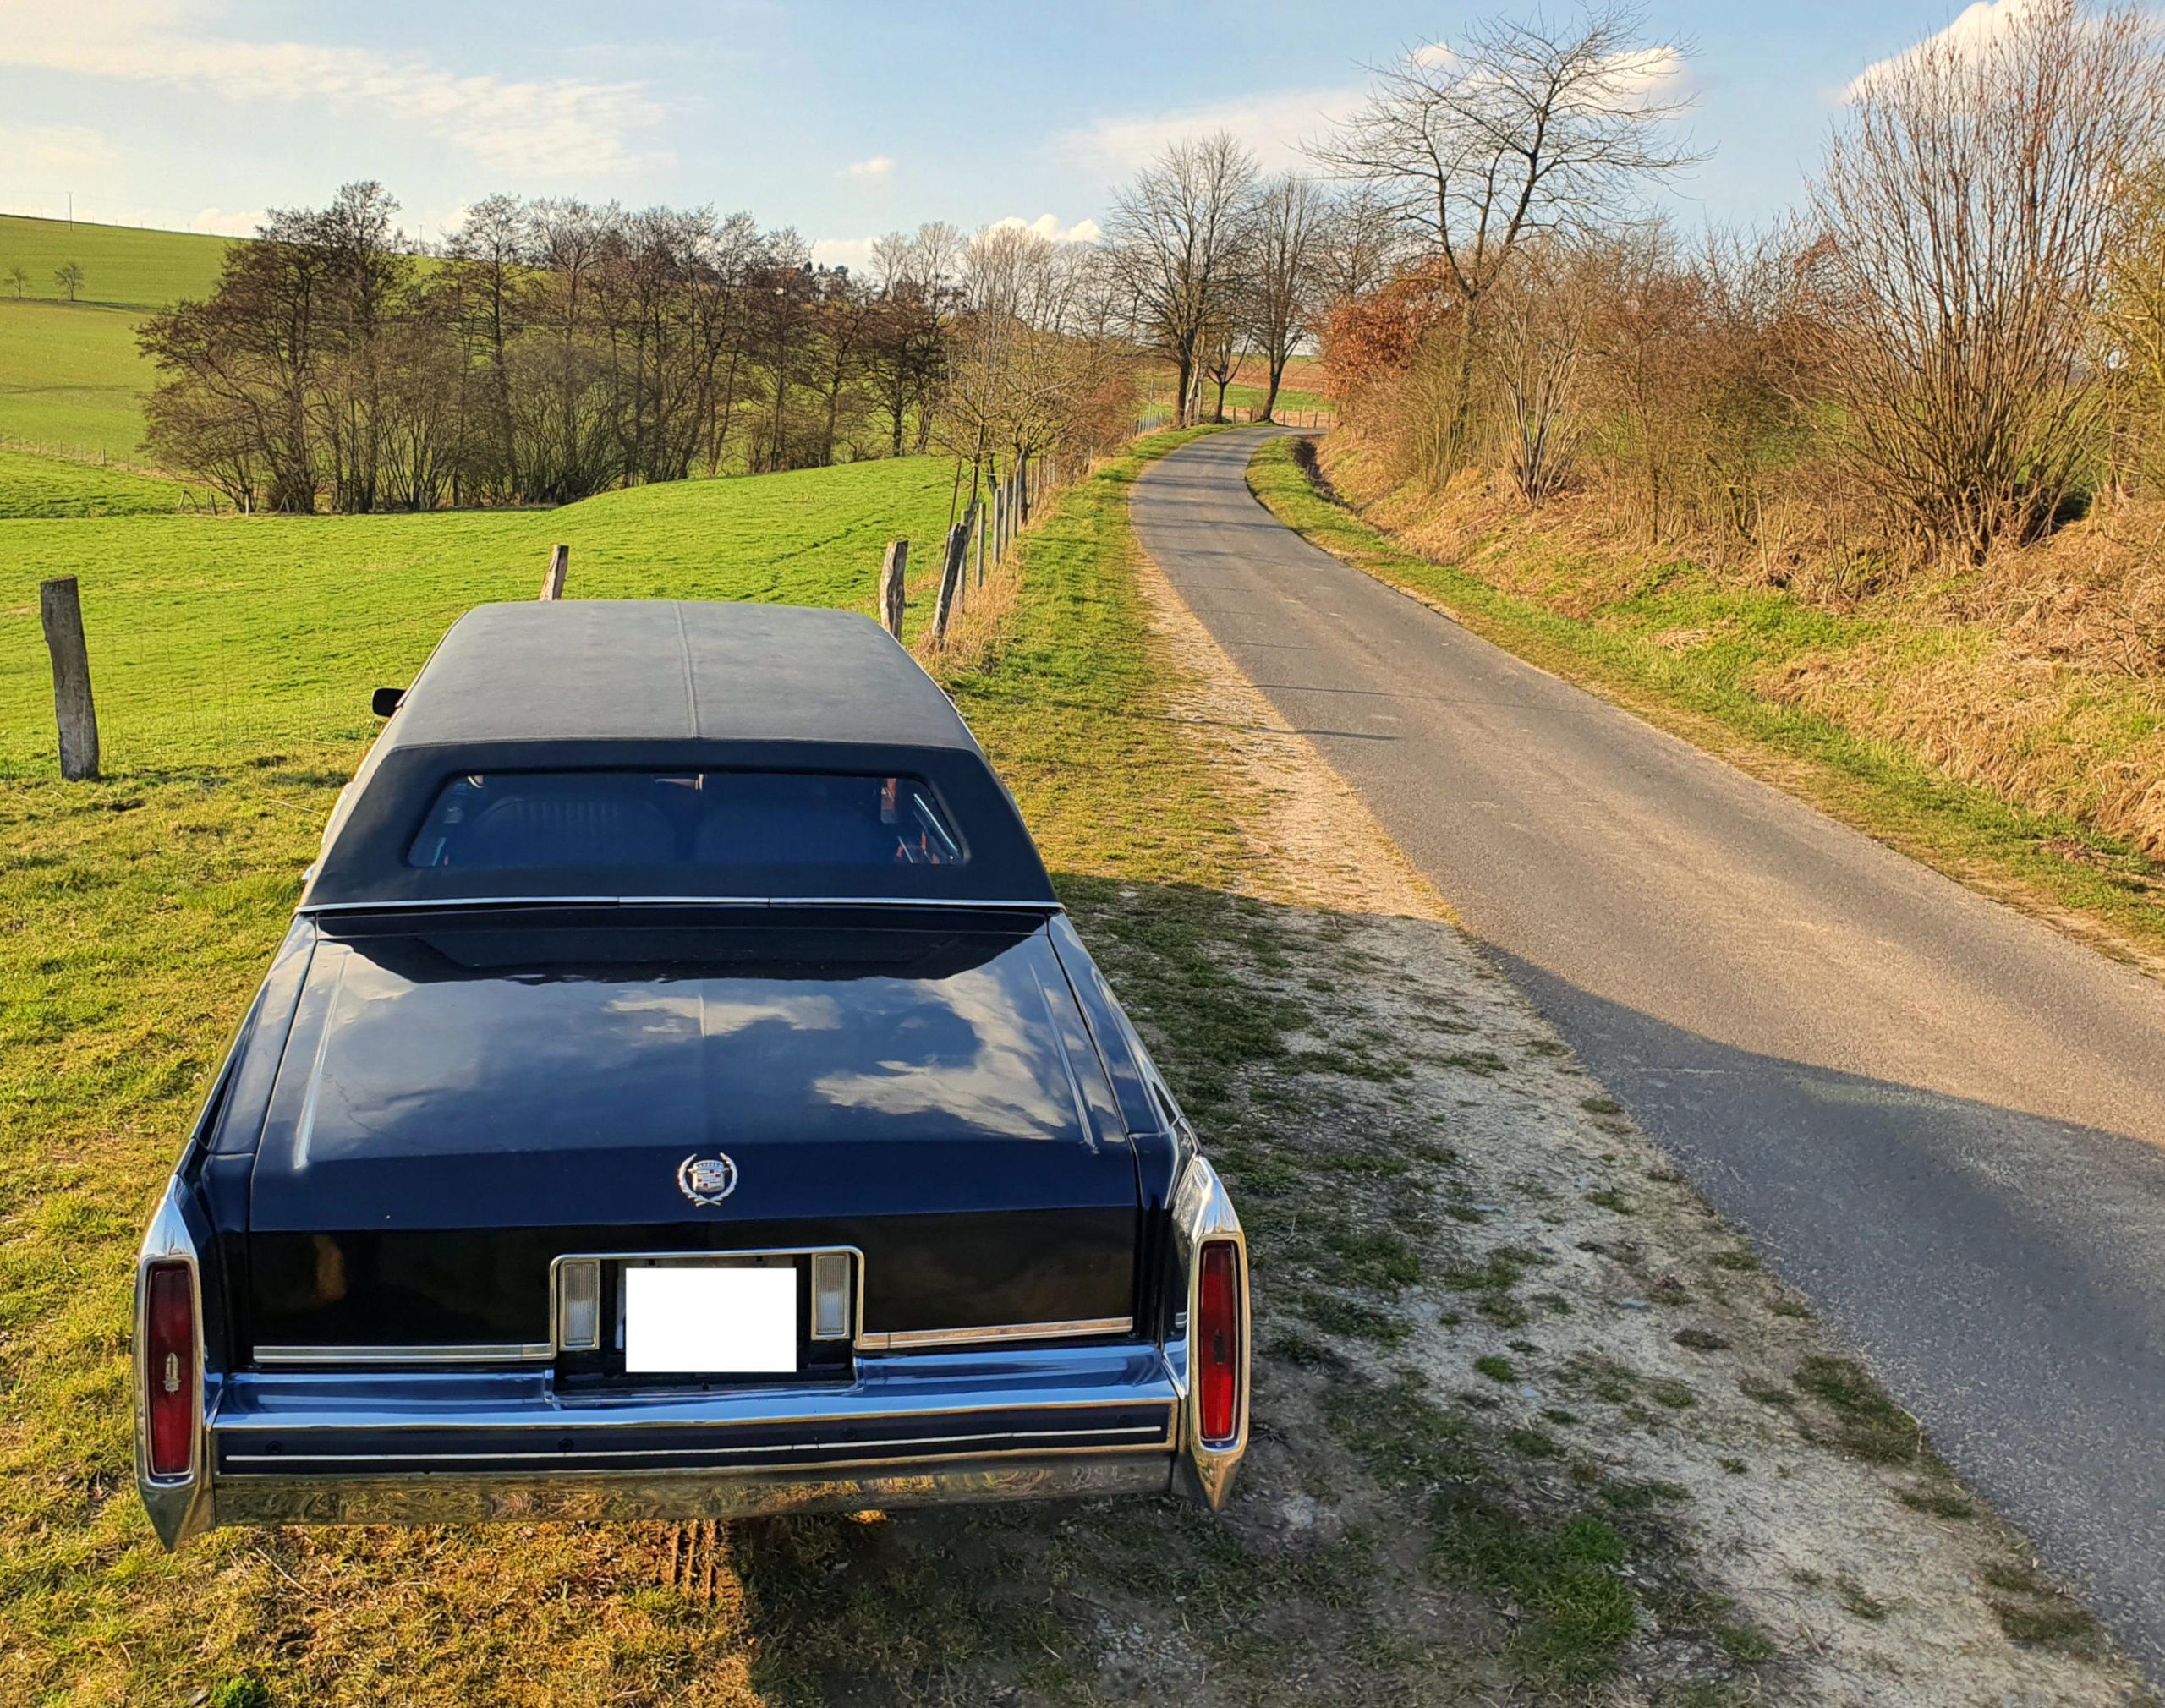 Cadillac Fleetwood Talisman zum vermieten aus Göttingen